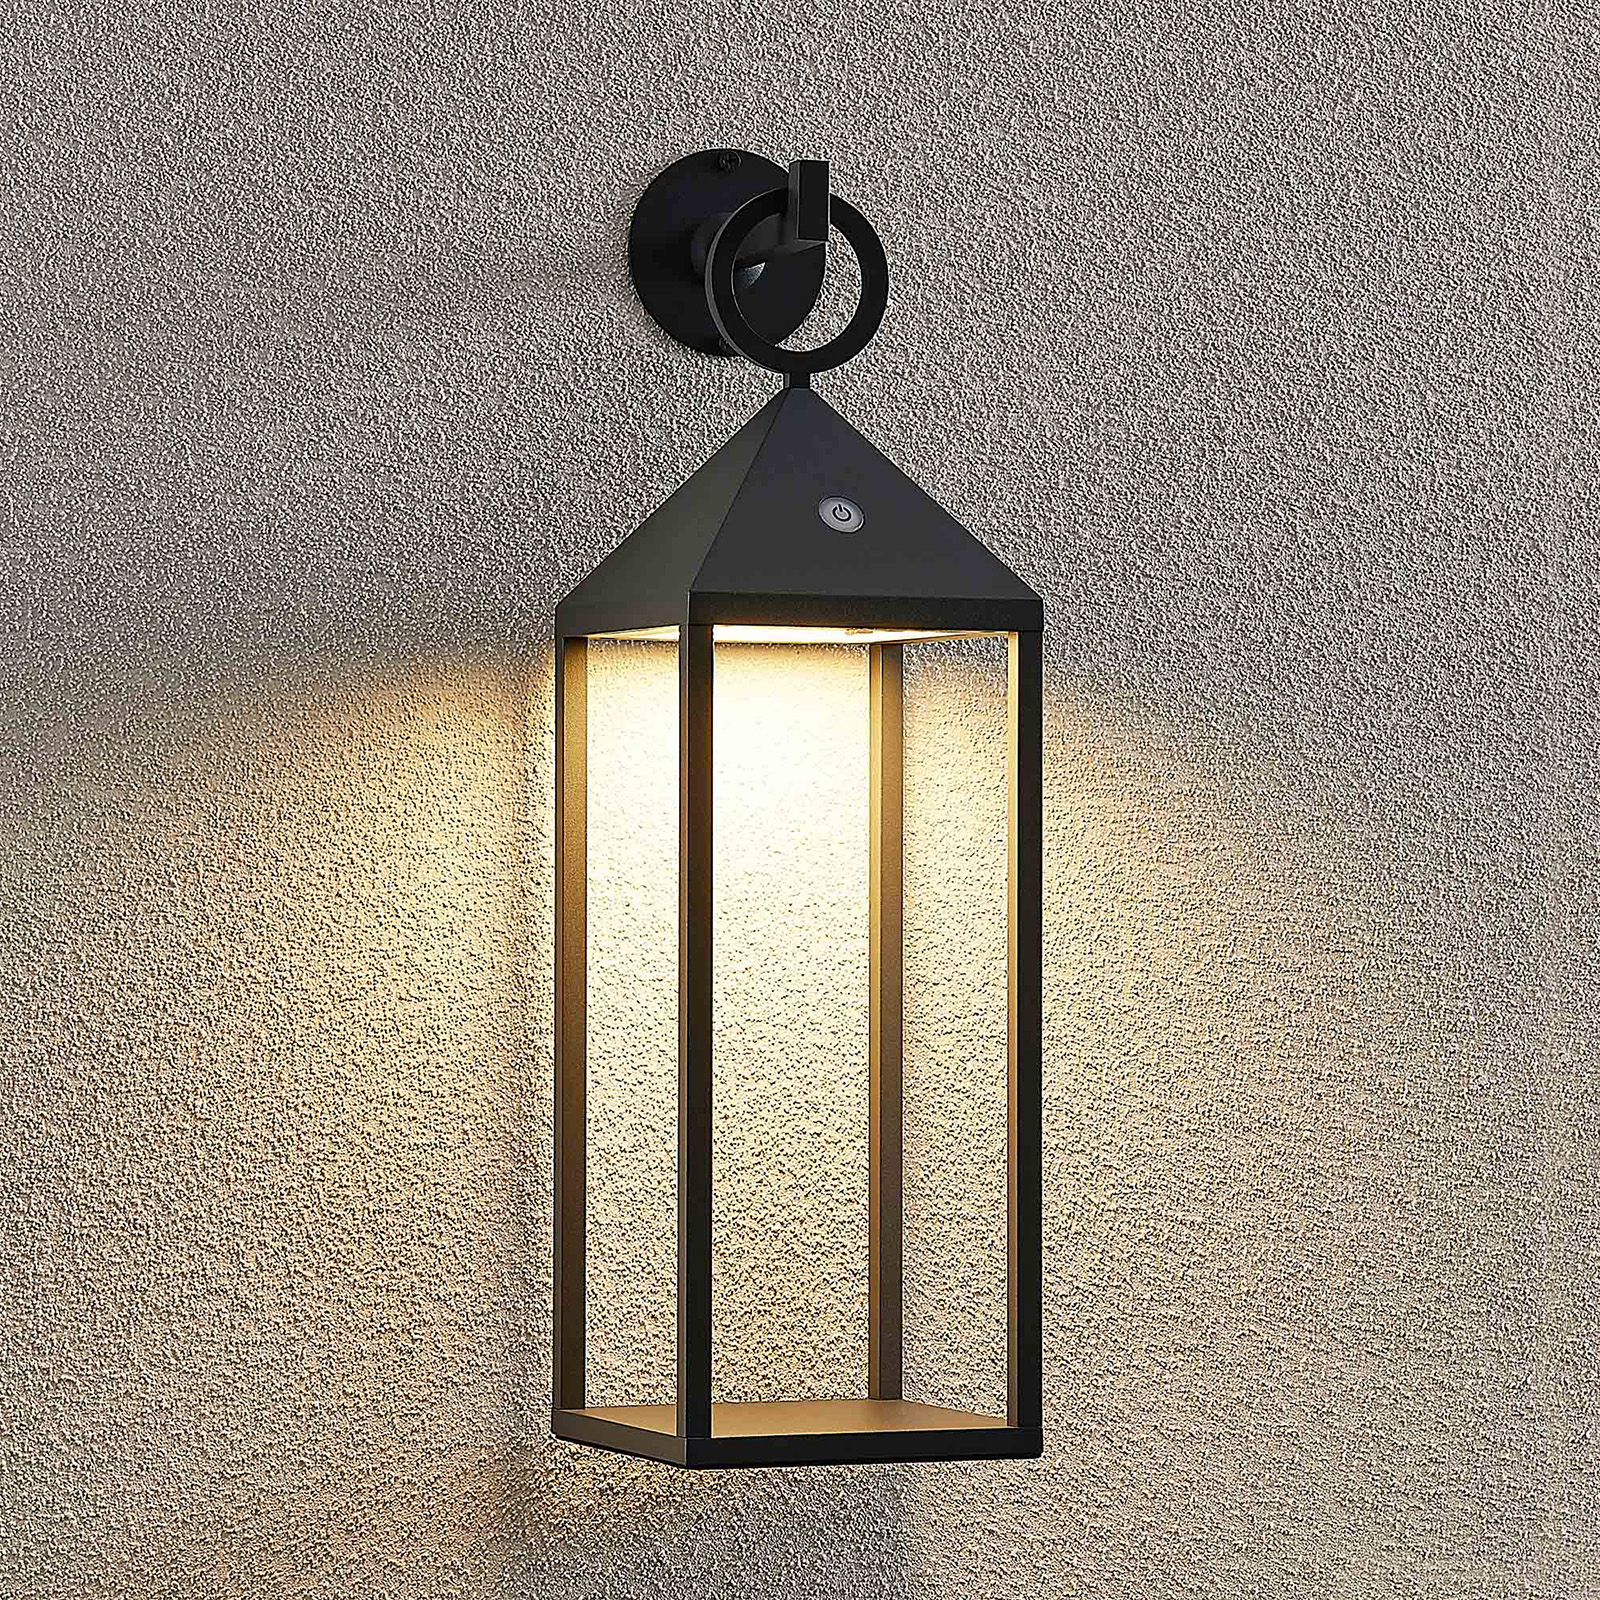 Lucande Aviel LED-Außenwandleuchte, portabel